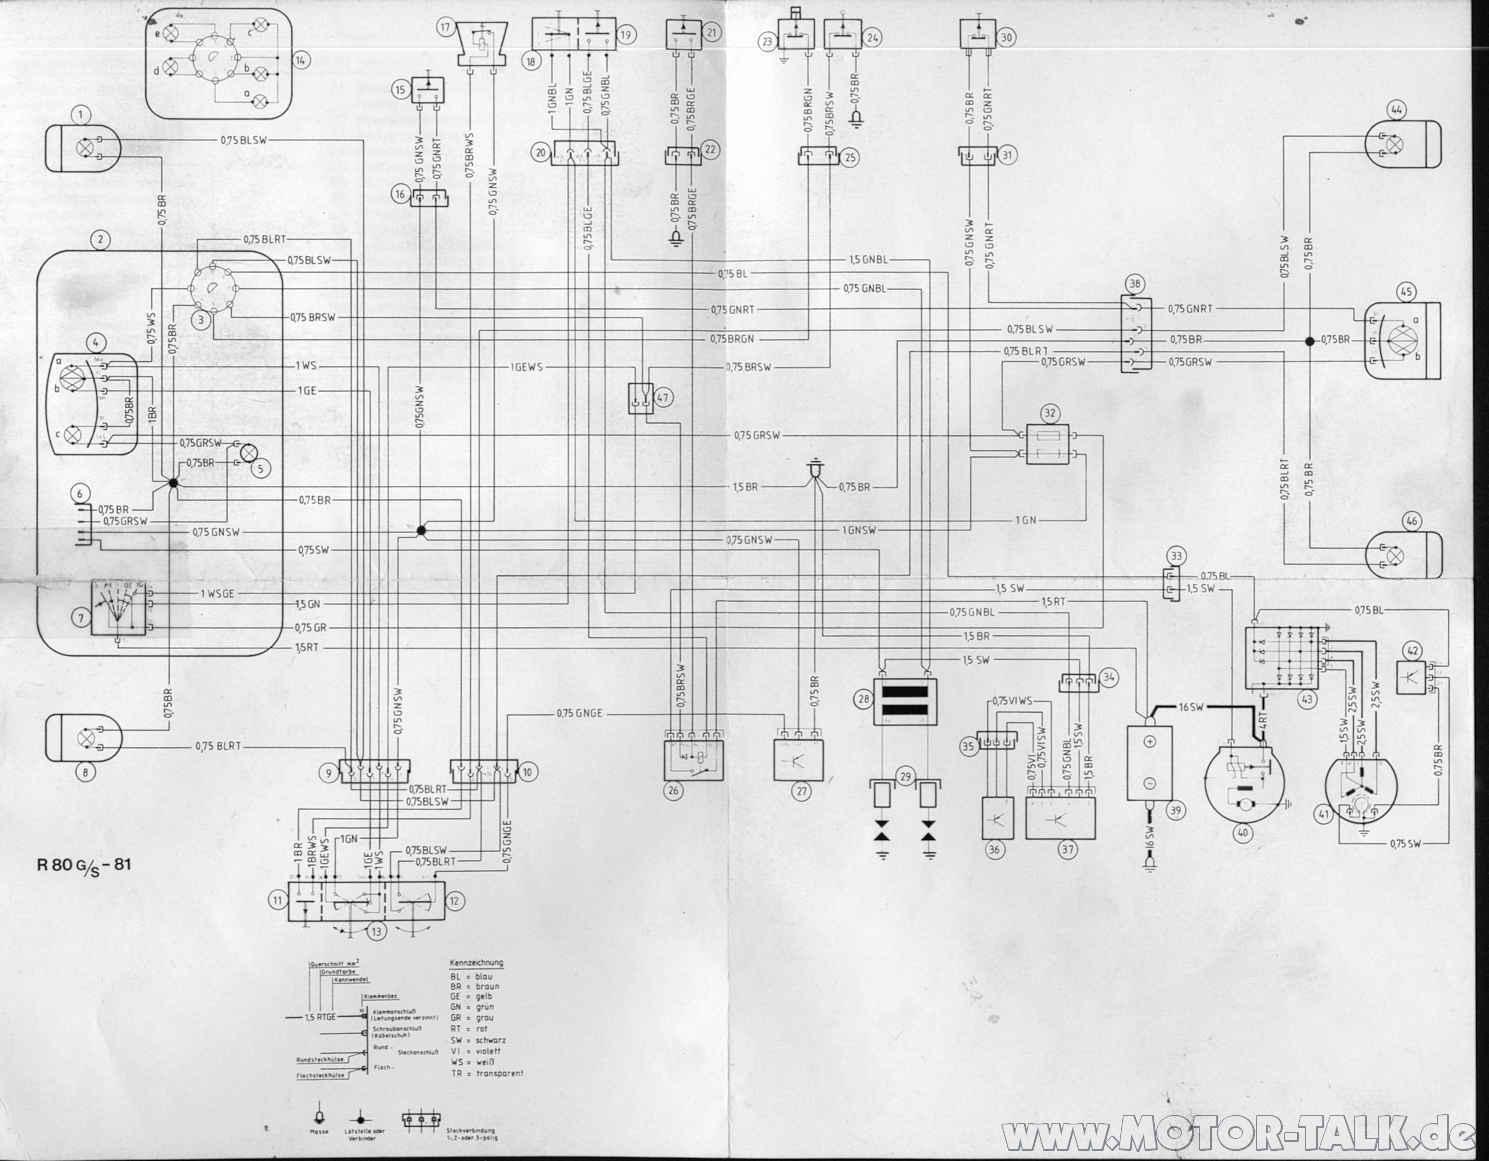 hight resolution of bmw r60 2 wiring diagram bmw auto wiring diagram